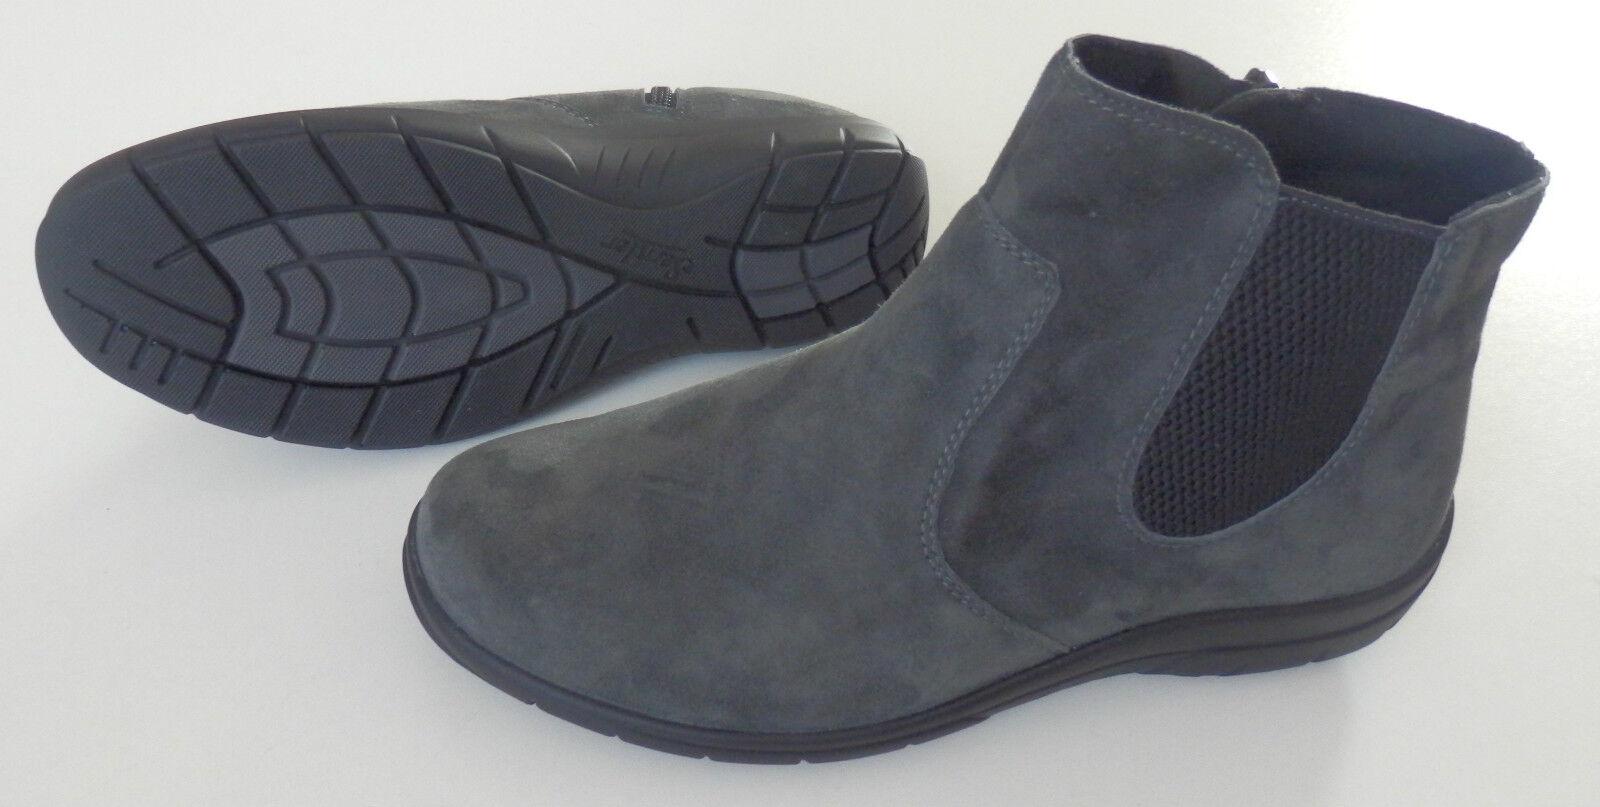 Chelsea Boot H Stiefelette Semler Weite H Boot grau  33 35,5 36 37,5 39 44 b4f046